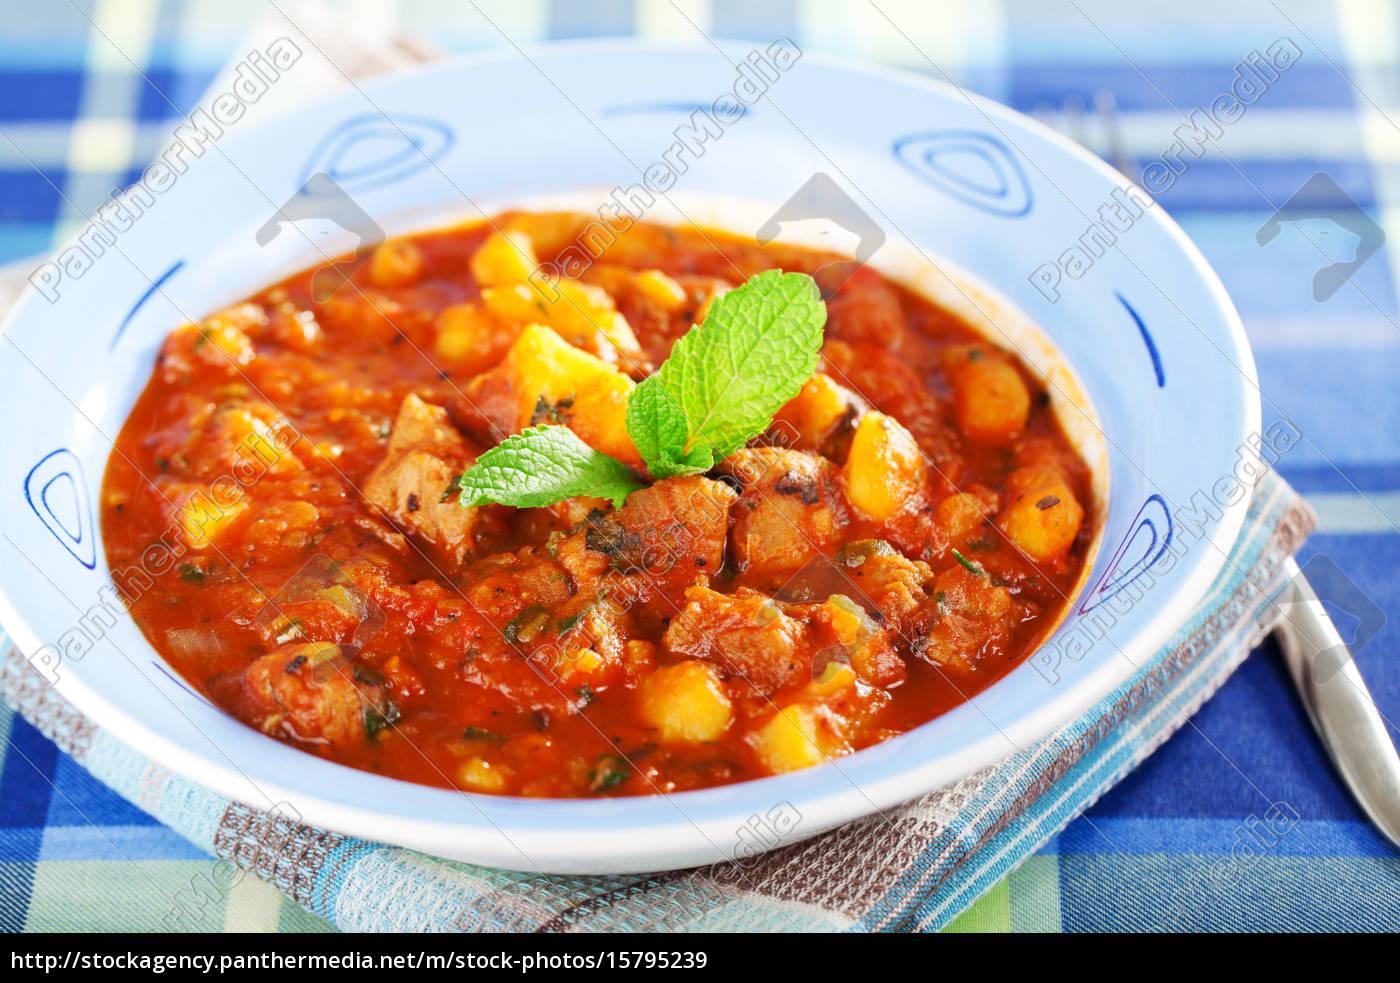 lamb, stew, lamb, stew, lamb, stew, lamb, stew - 15795239